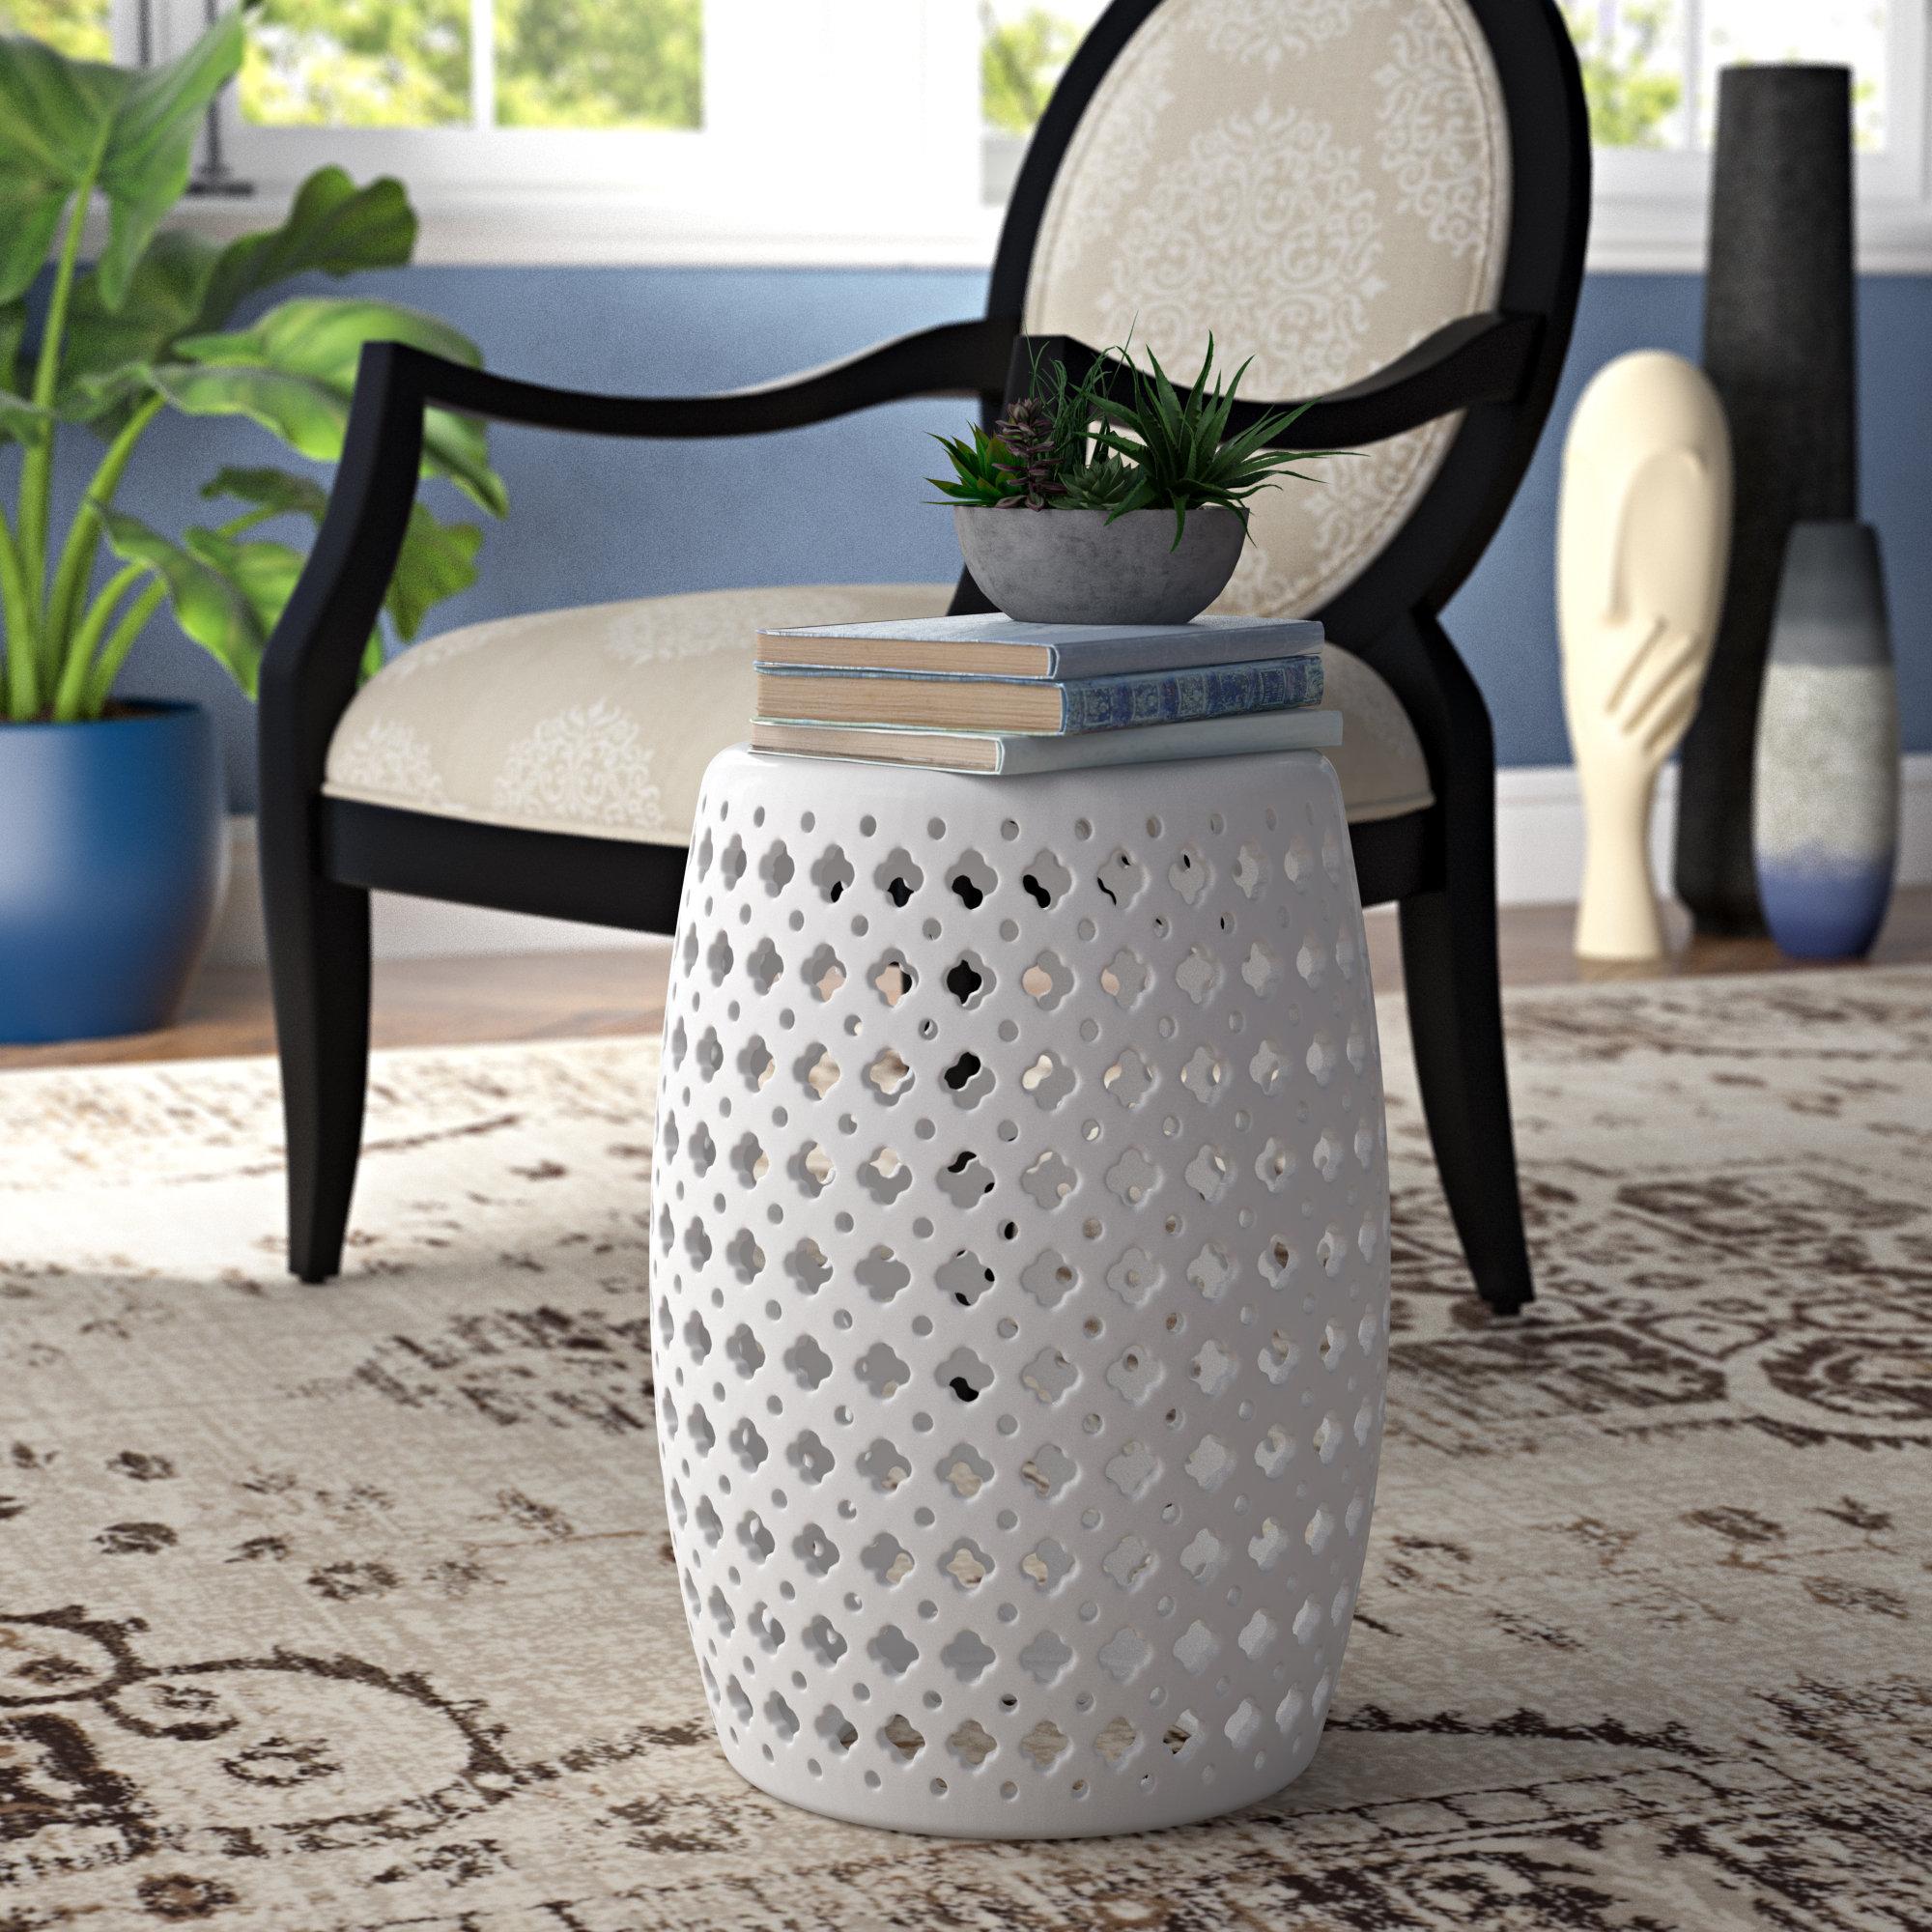 Terrific Gisella Garden Stool Andrewgaddart Wooden Chair Designs For Living Room Andrewgaddartcom